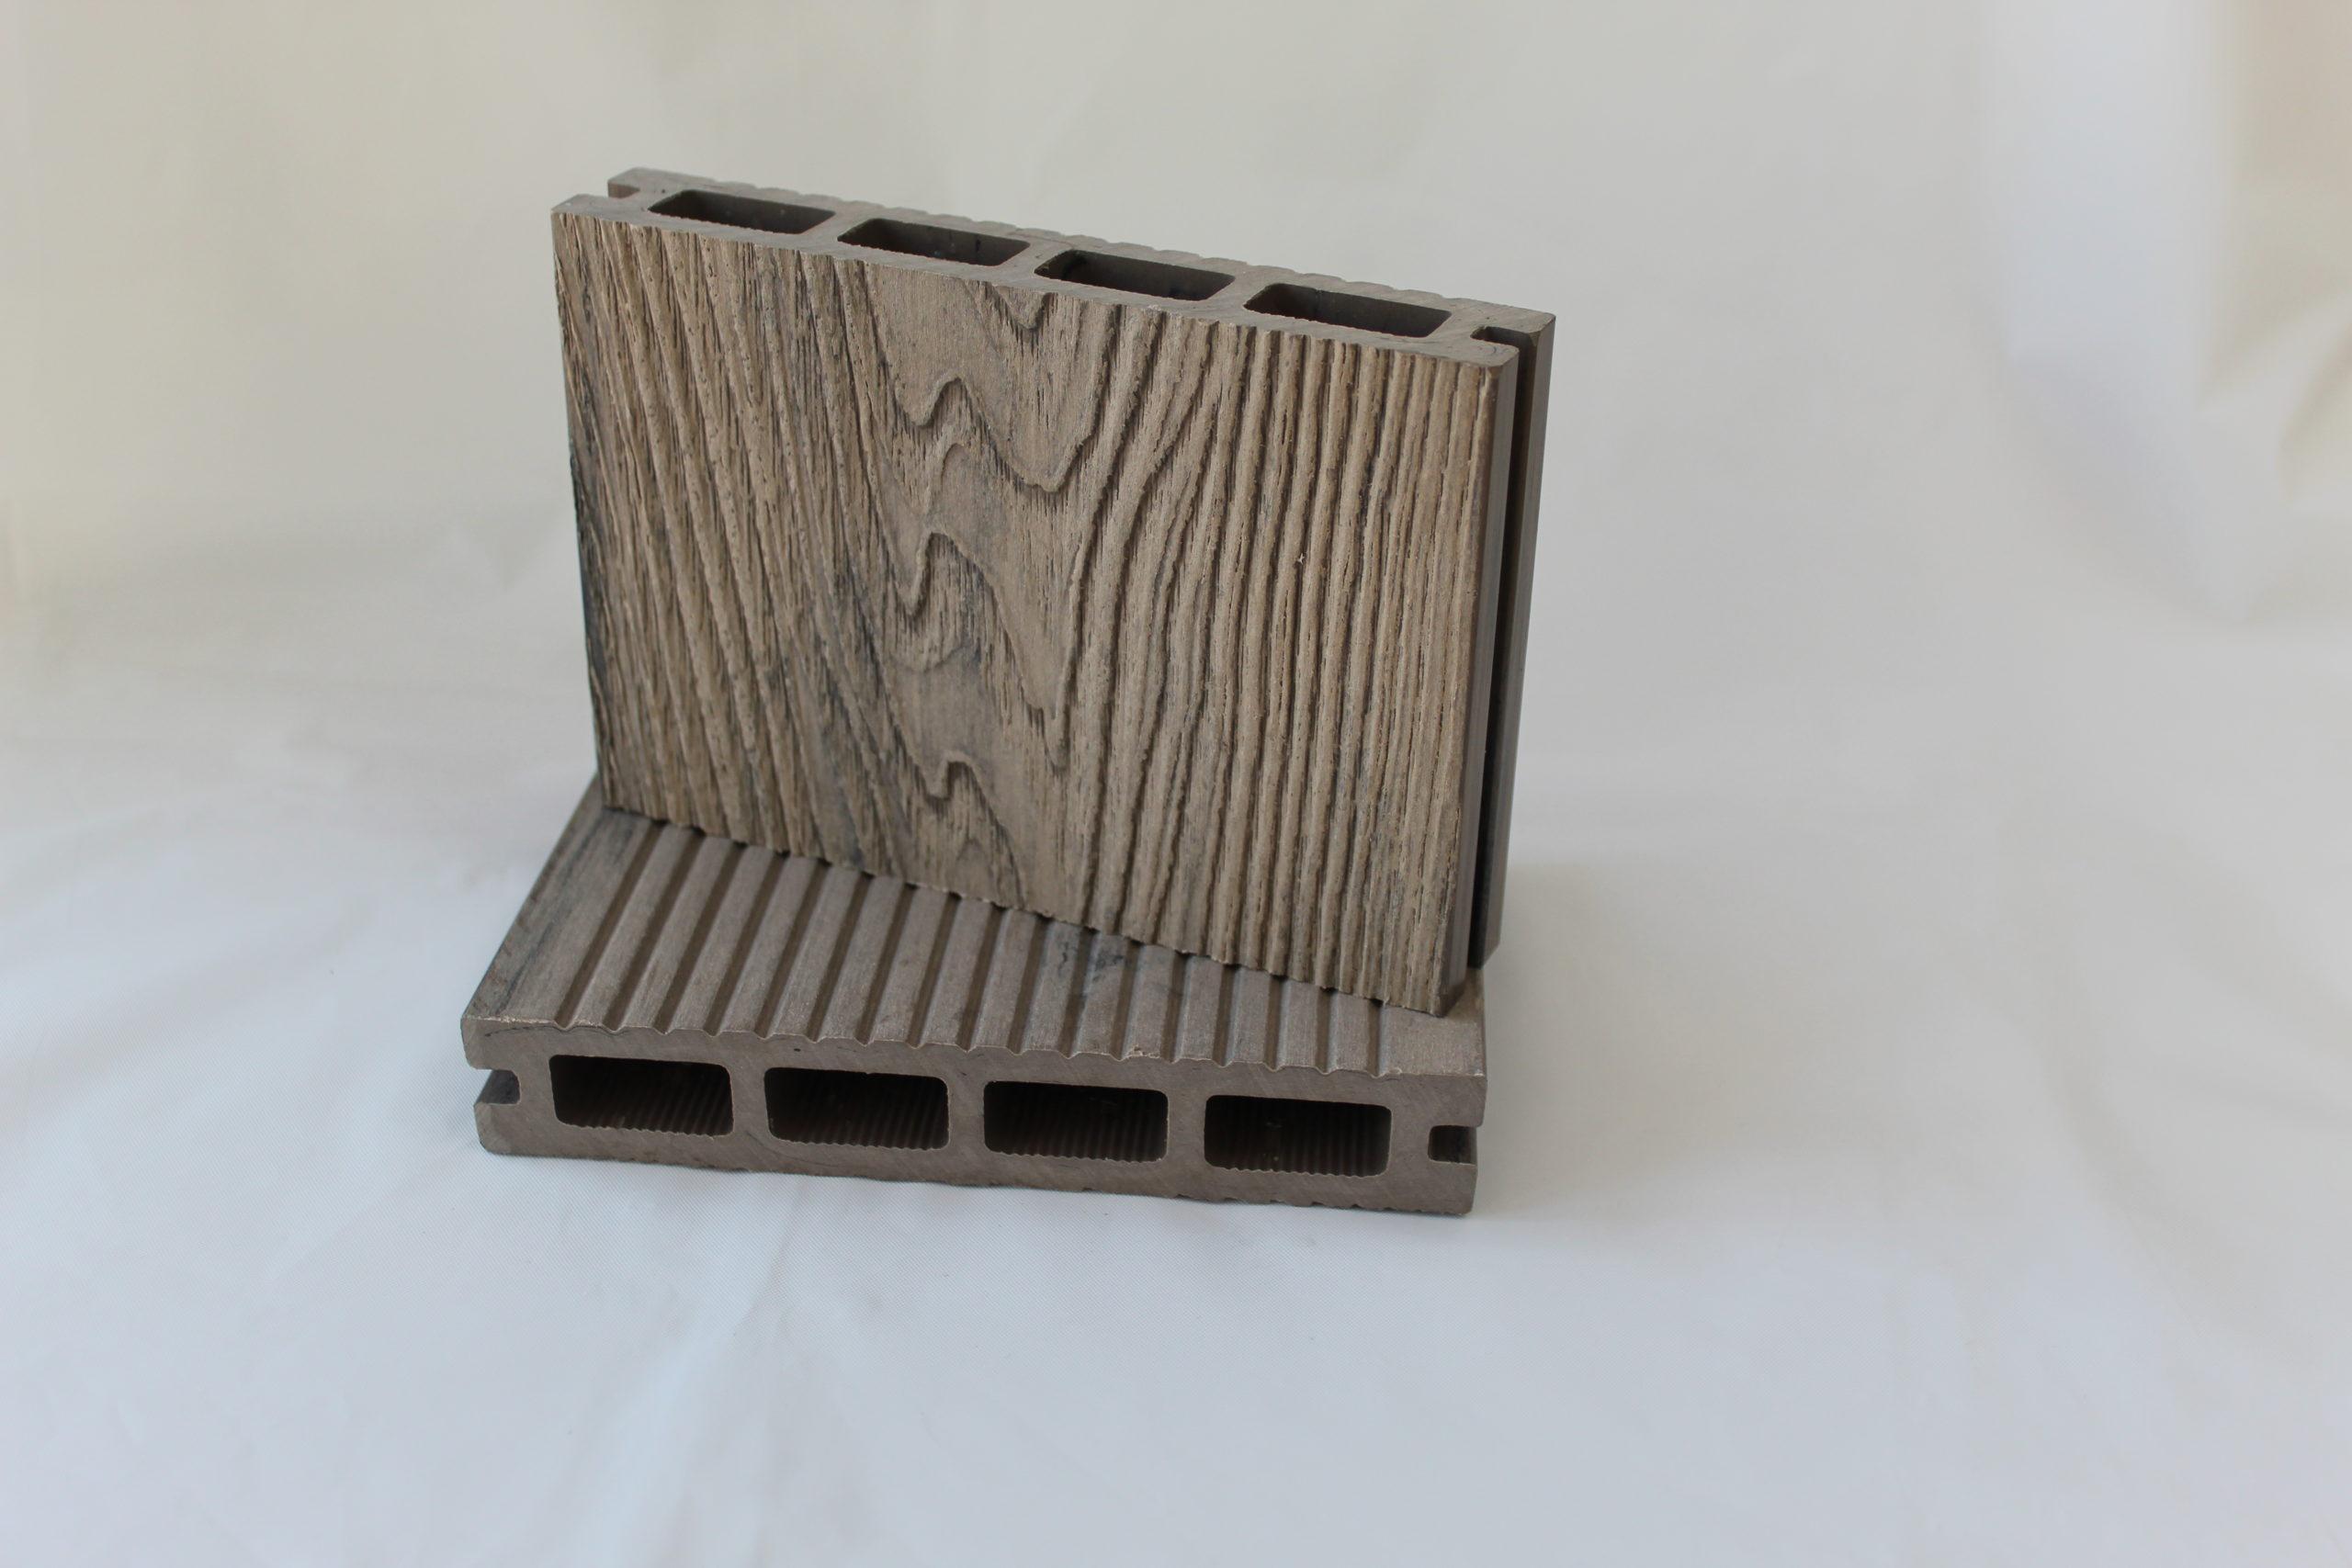 <b>STONE</b><br><i>embossed woodgrain</i></br>